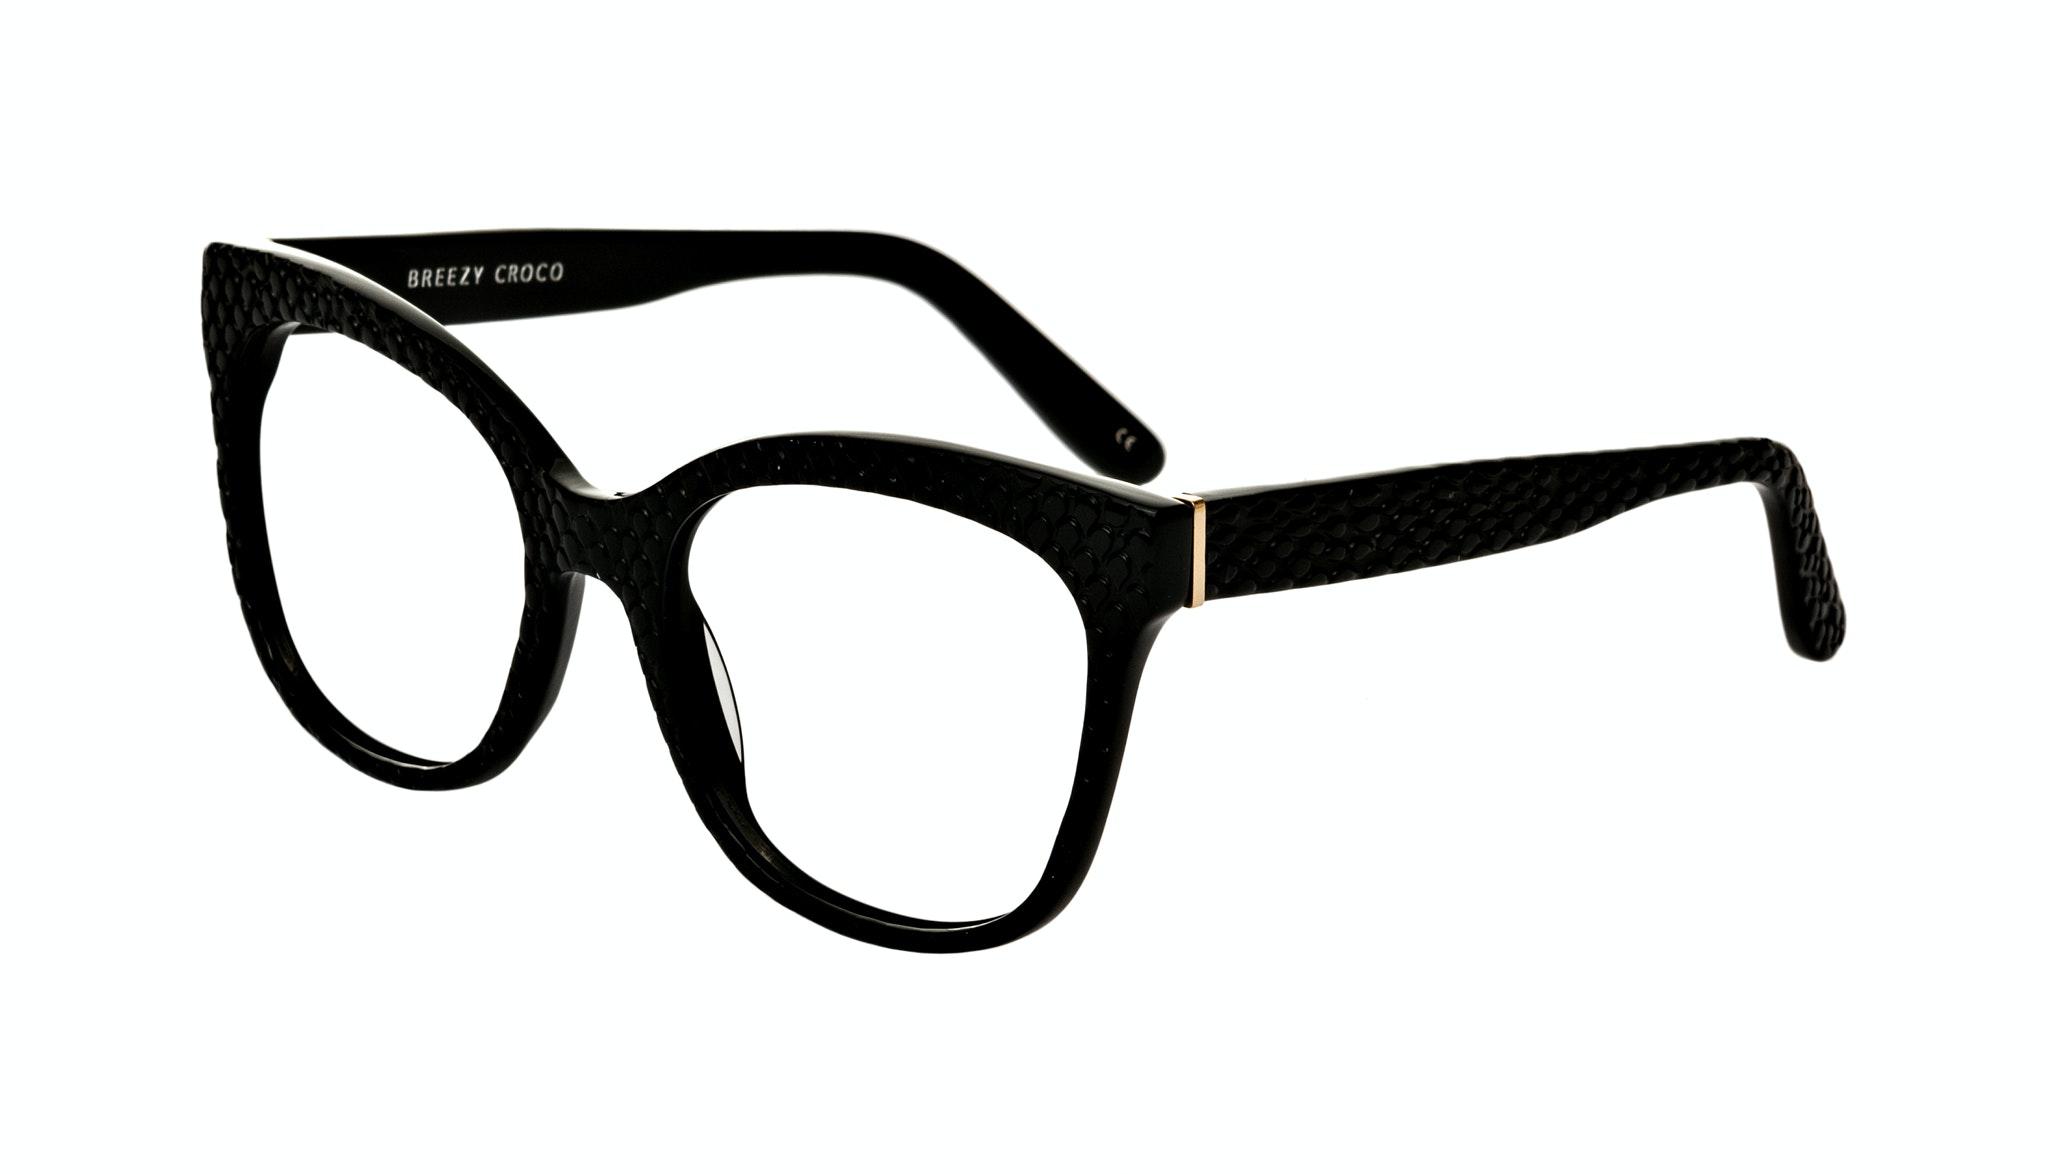 Affordable Fashion Glasses Rectangle Square Eyeglasses Women Breezy Croco Tilt